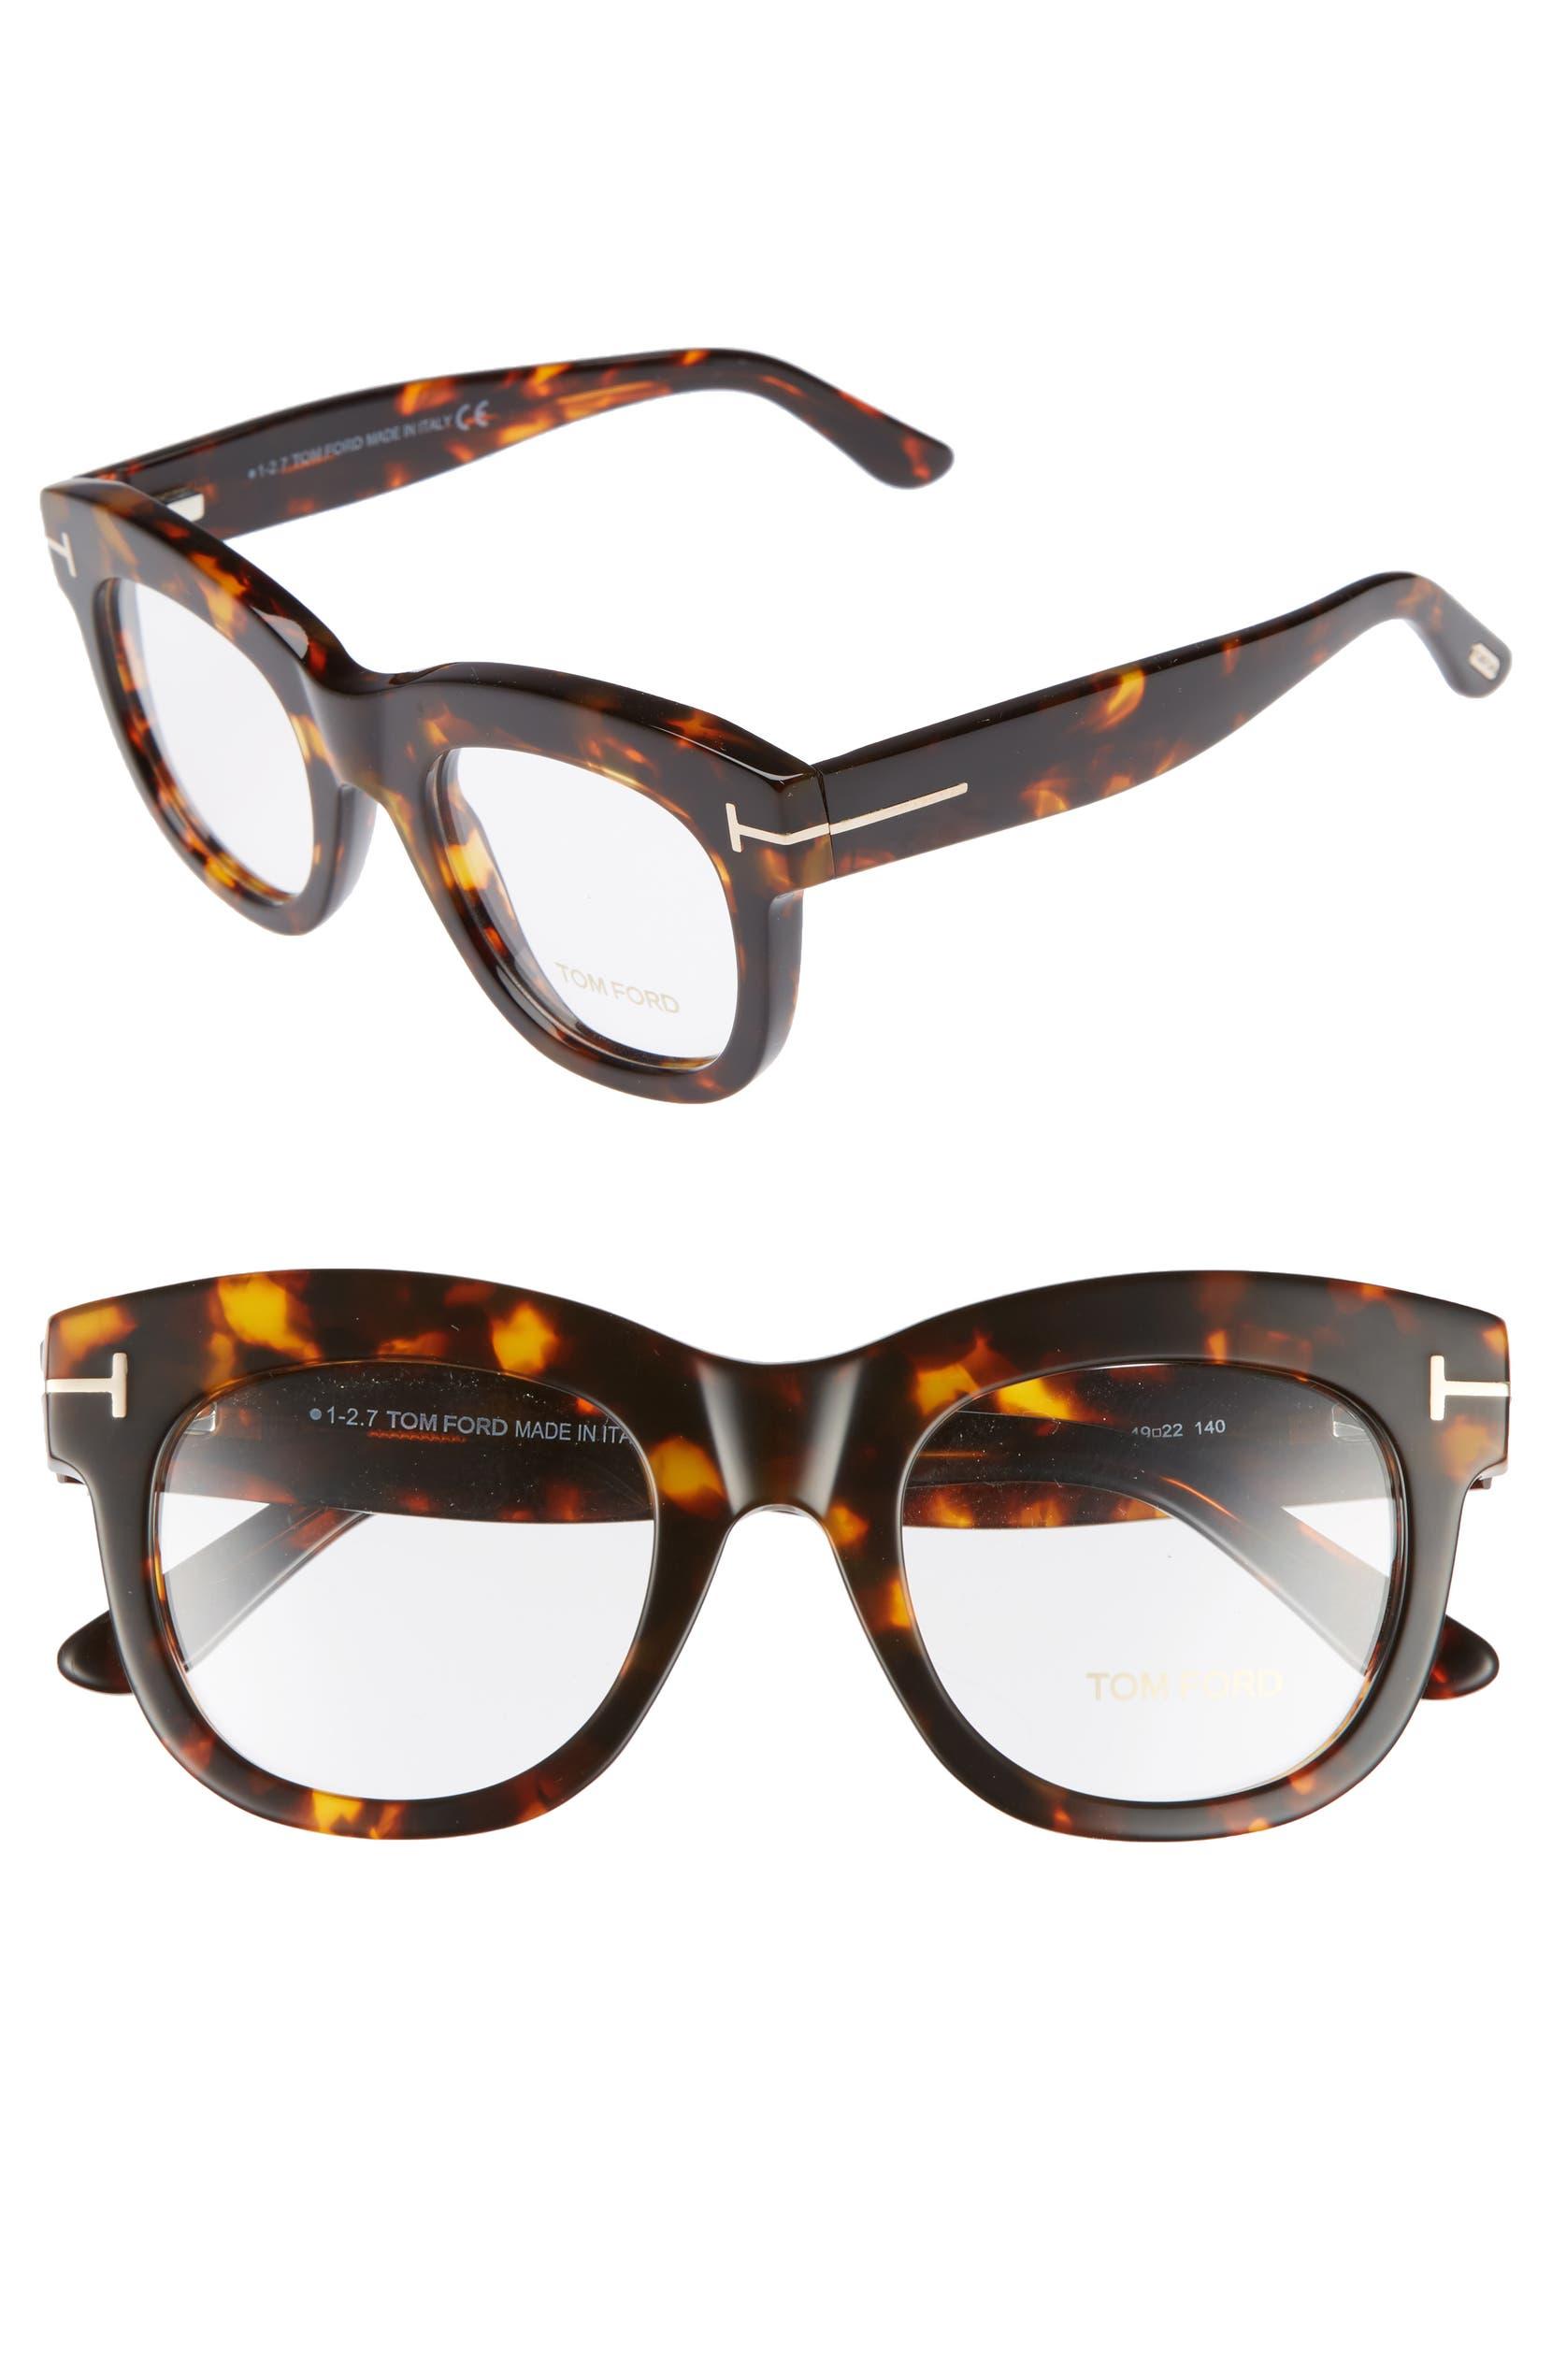 2a403a487c Tom Ford 49mm Optical Glasses